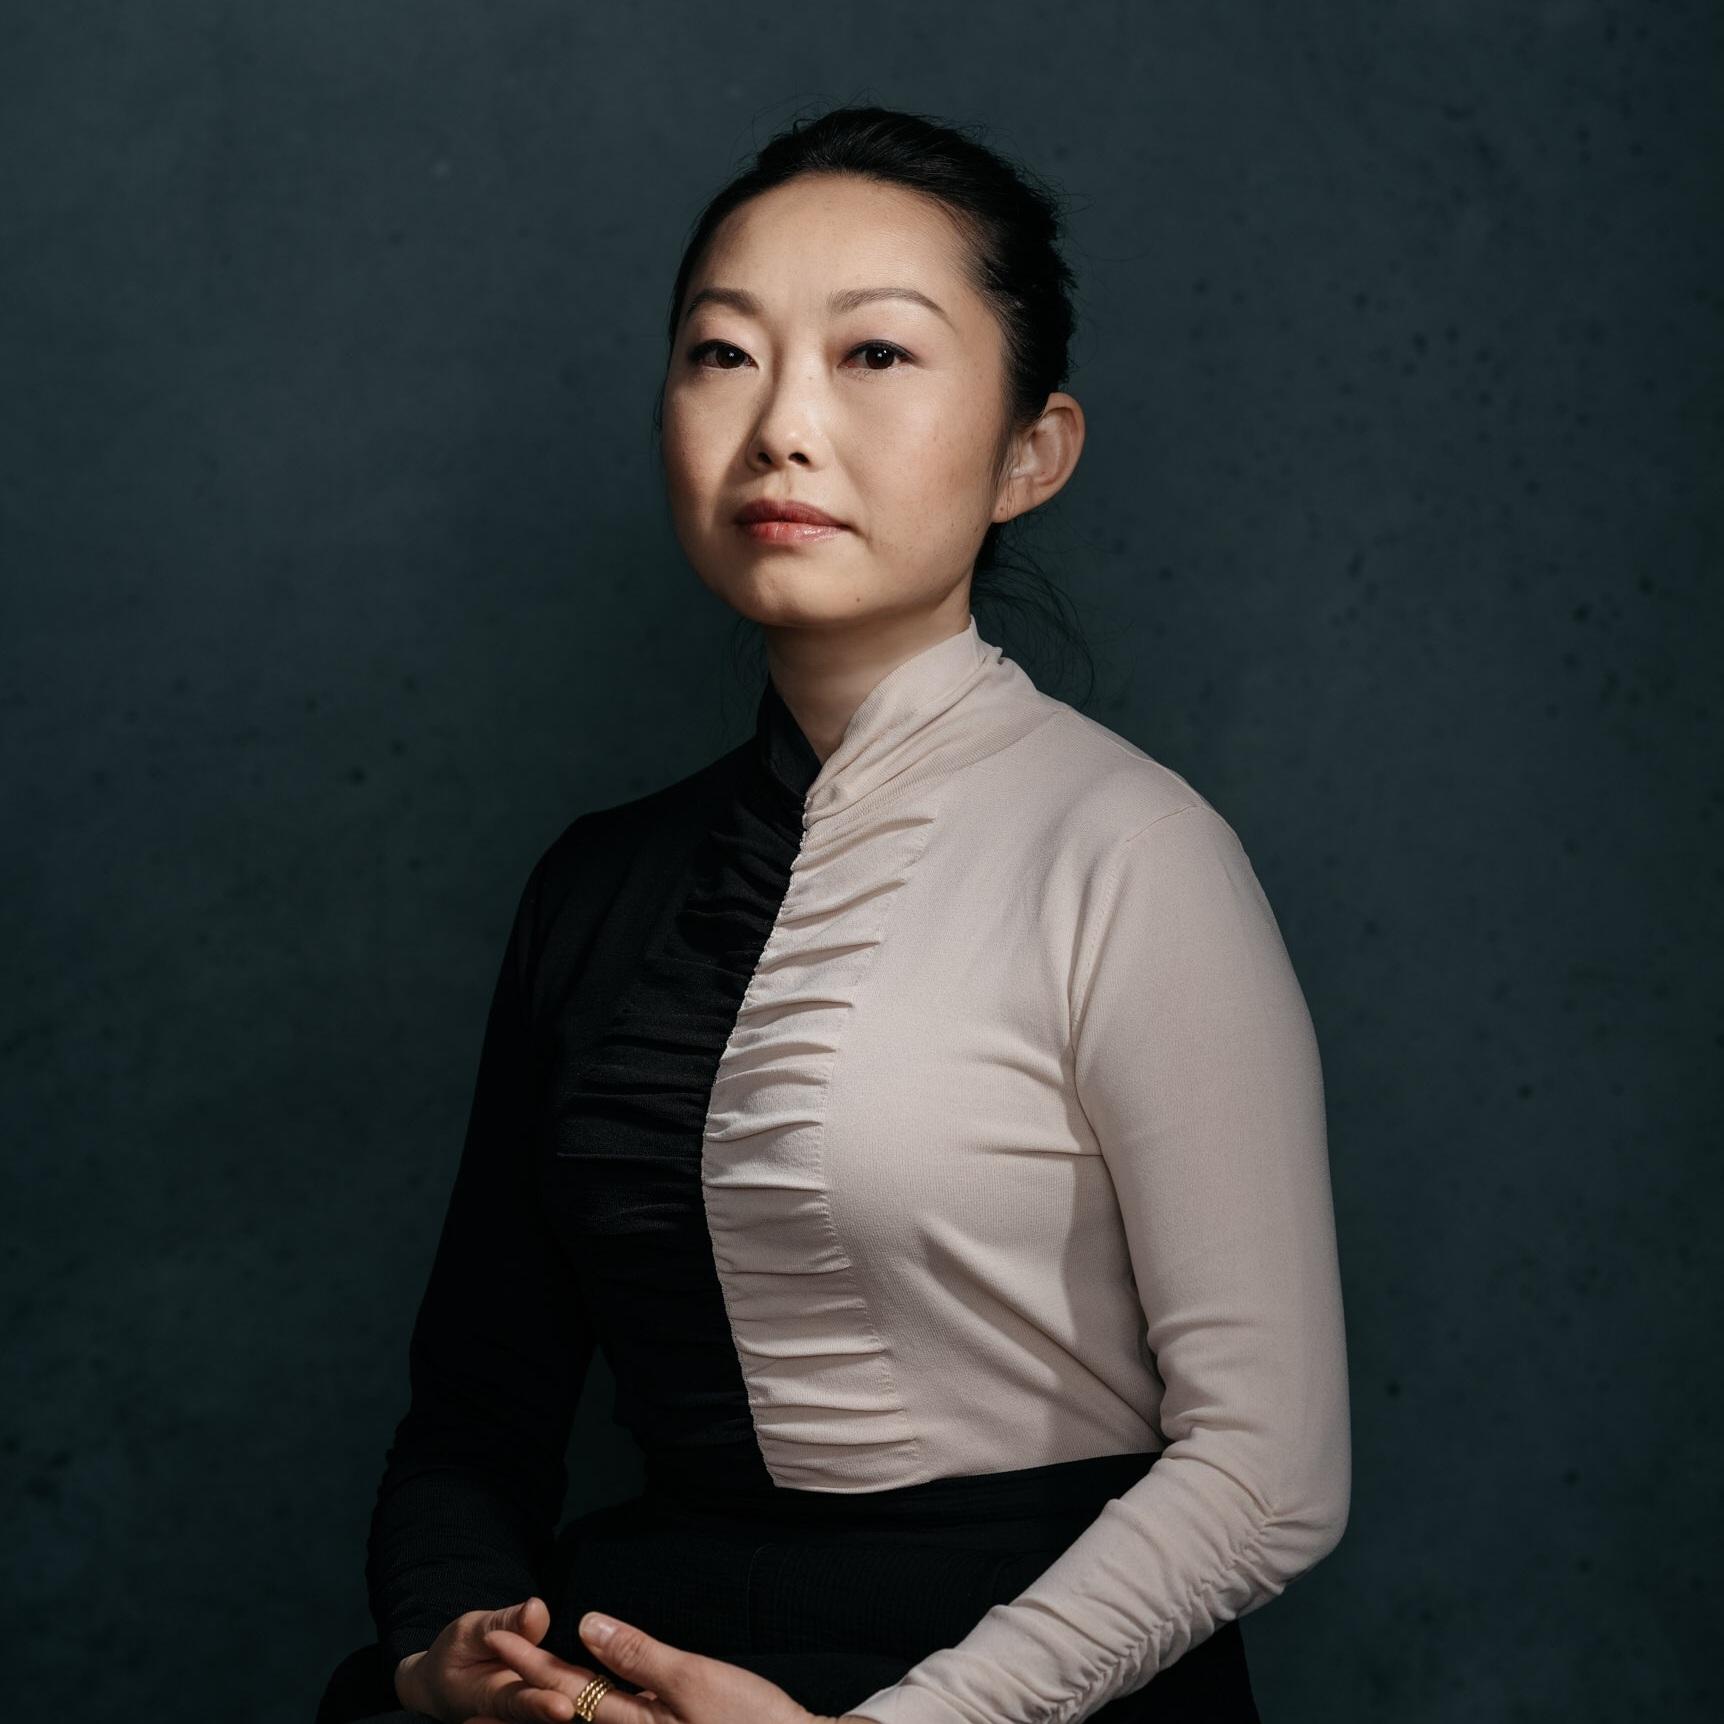 Lulu Wang  Director, The Farewell